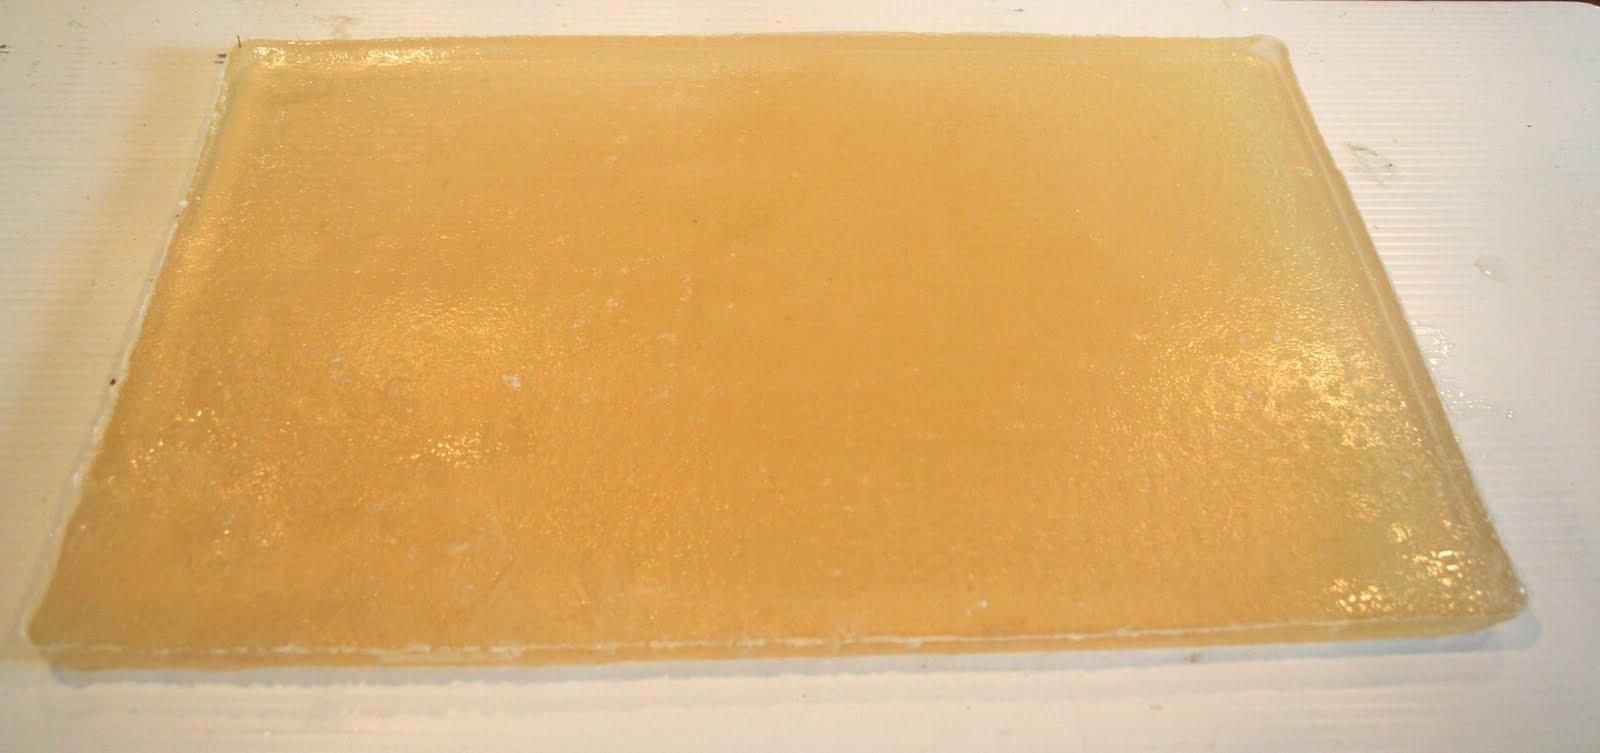 how to make plain gelatin